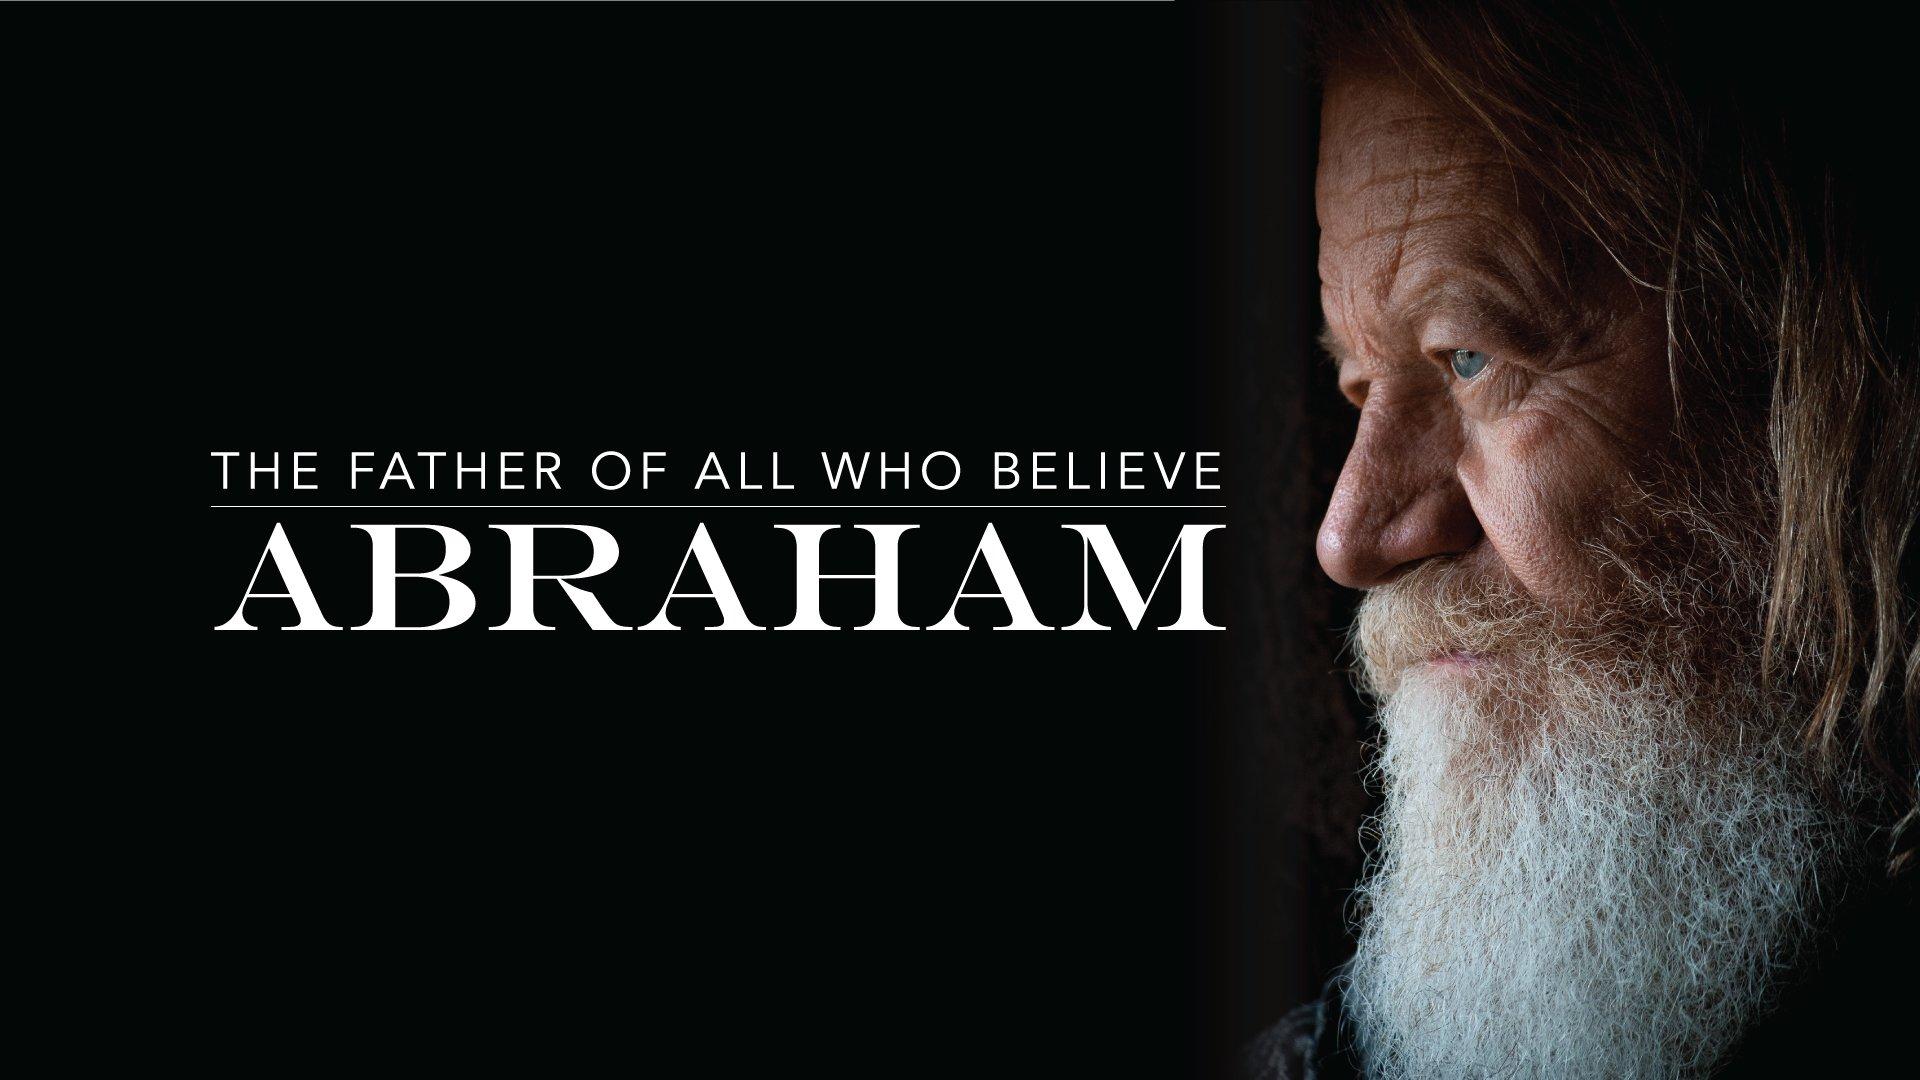 Abraham-1920x1080-1